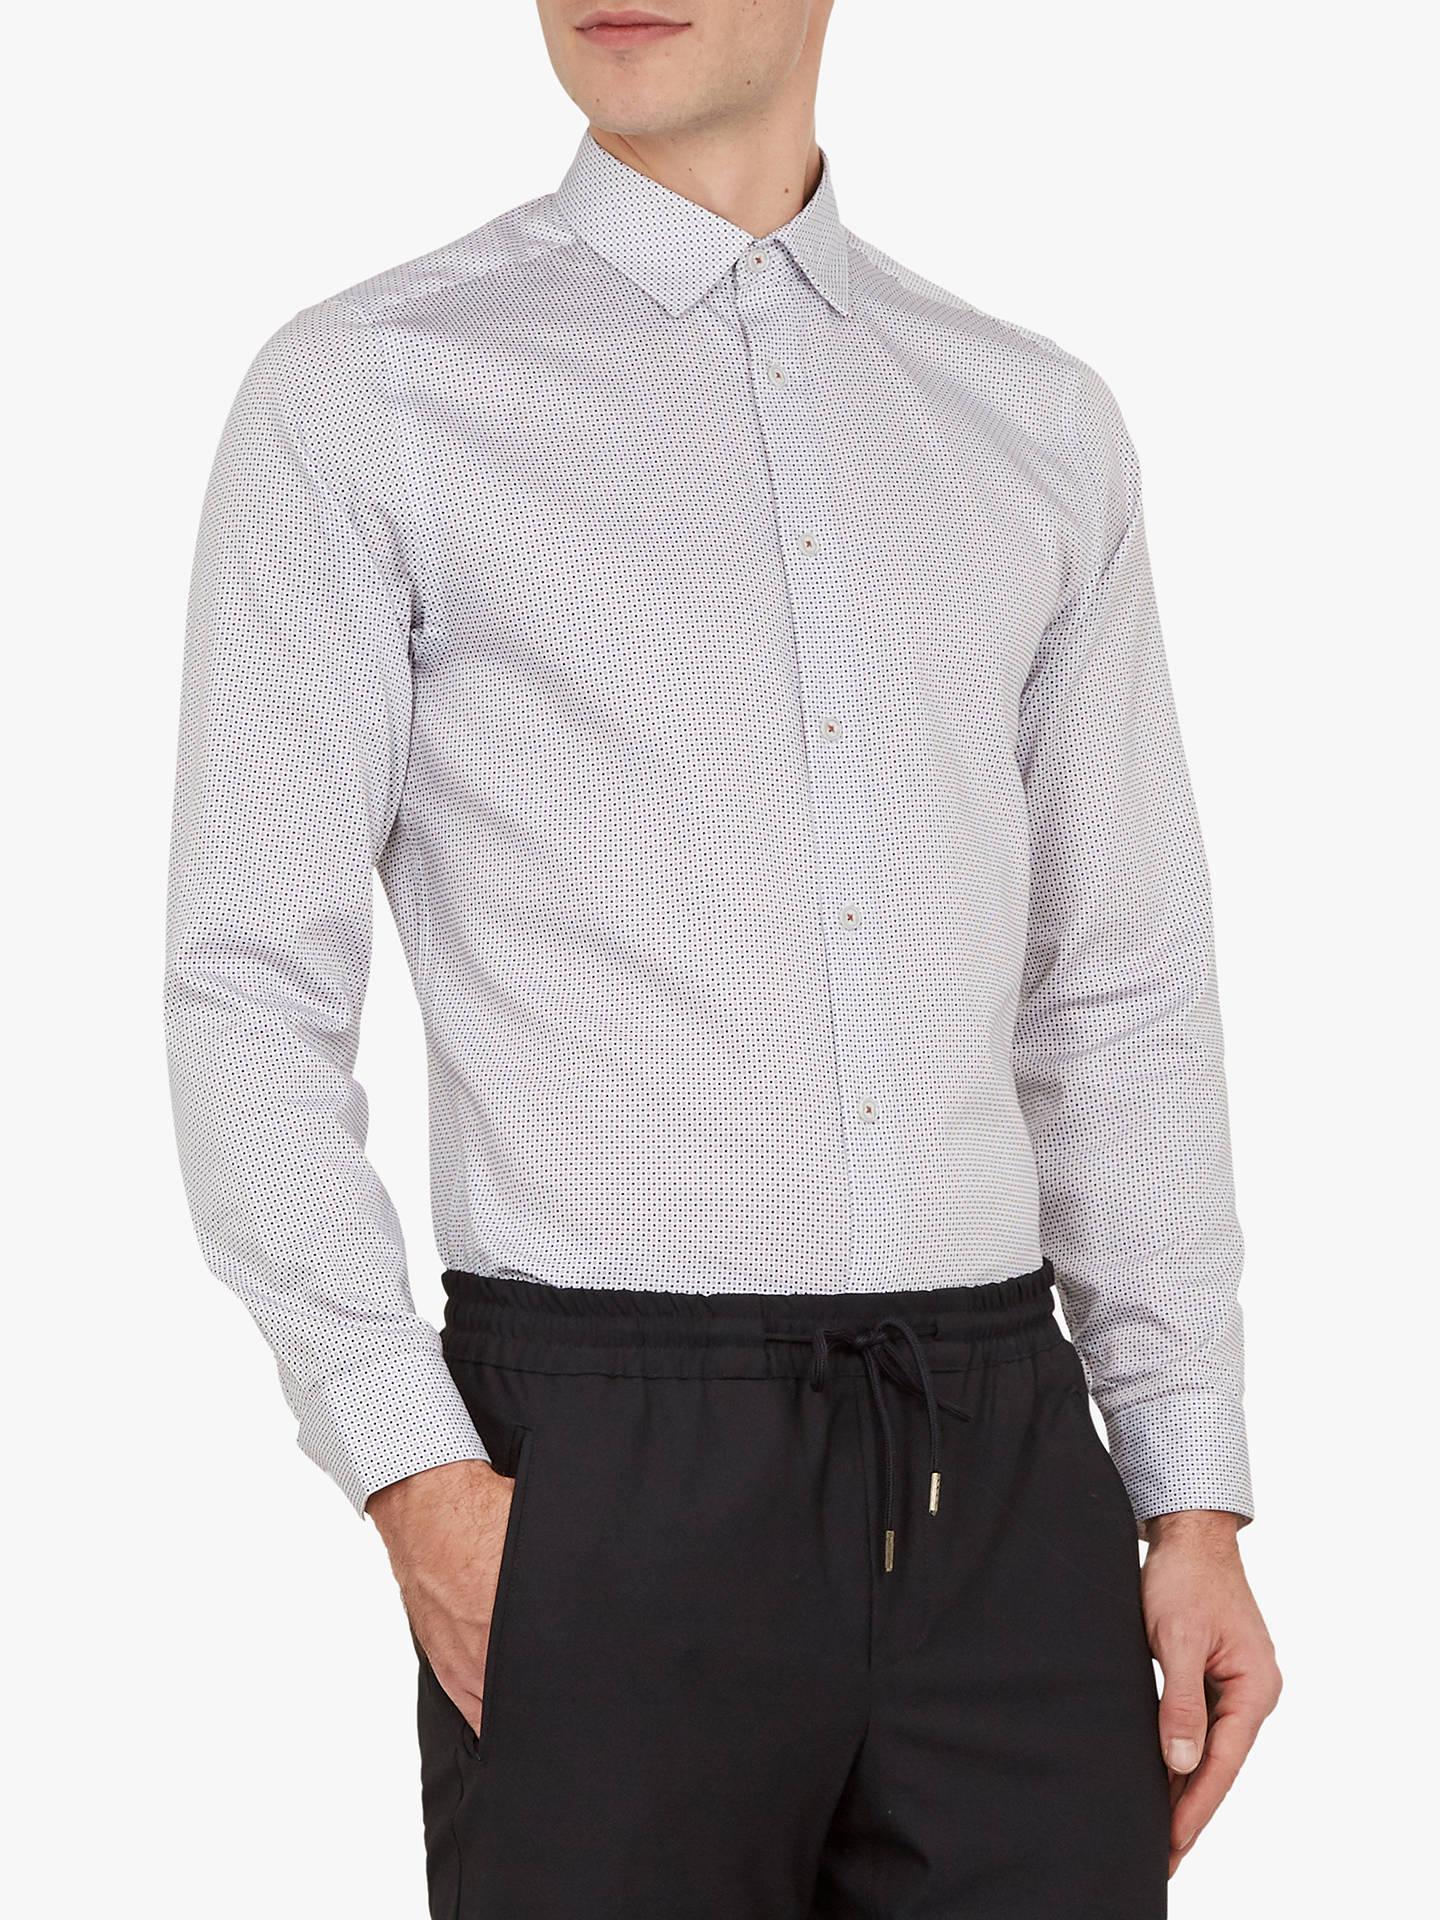 358955852a62d0 Ted Baker Subik Geo Print Slim Fit Shirt at John Lewis   Partners